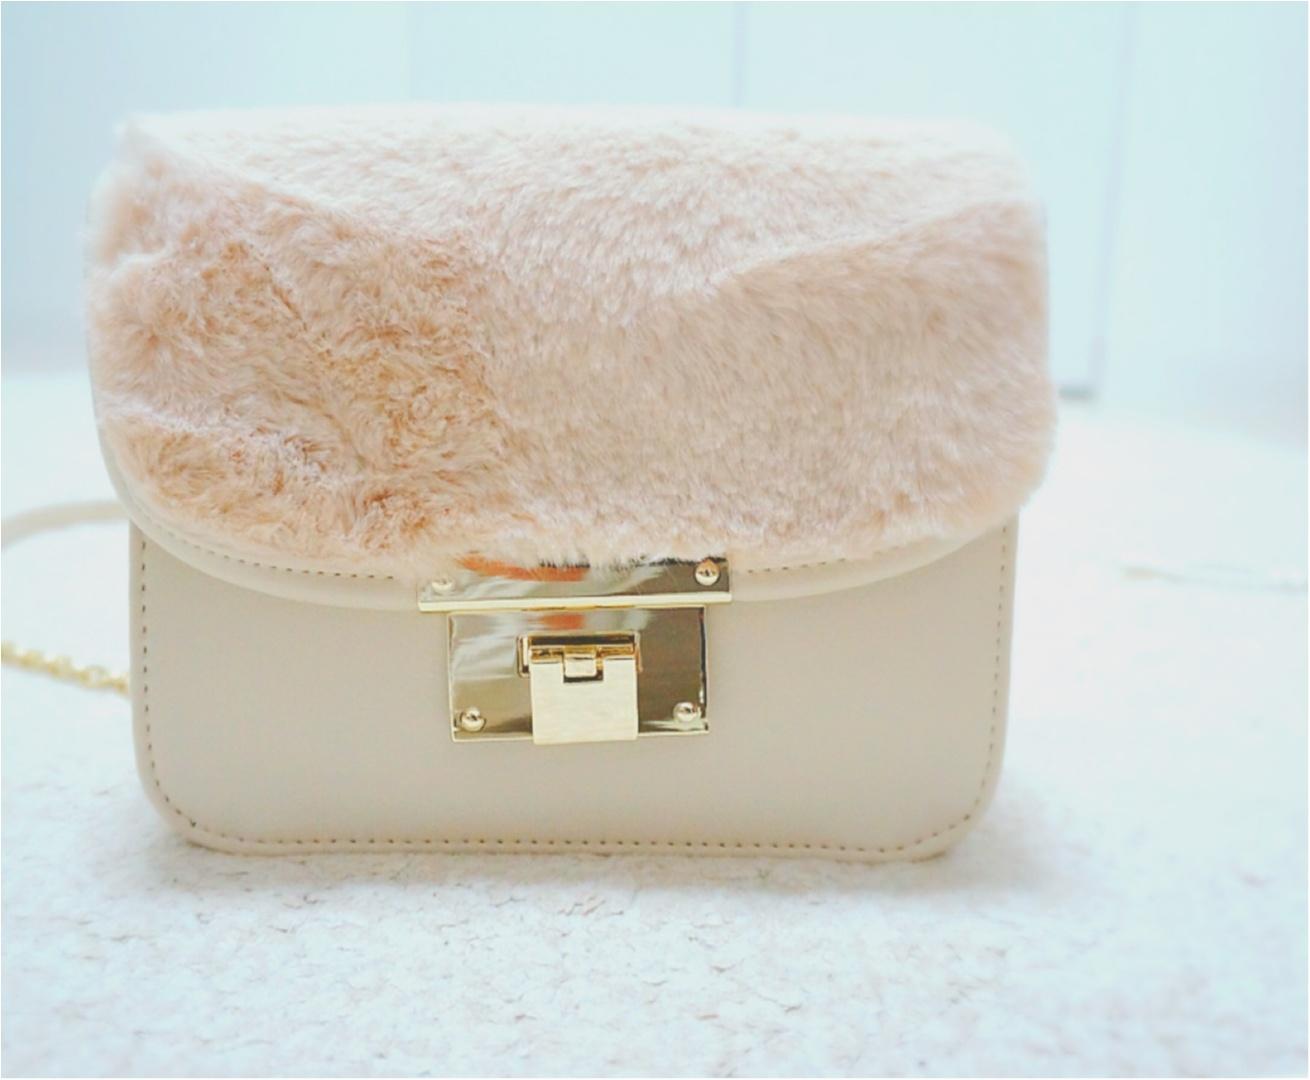 SNSで大人気!【Honeys】の《メトロポリス風》ファー付きバッグがプチプラ&可愛い❤️_2